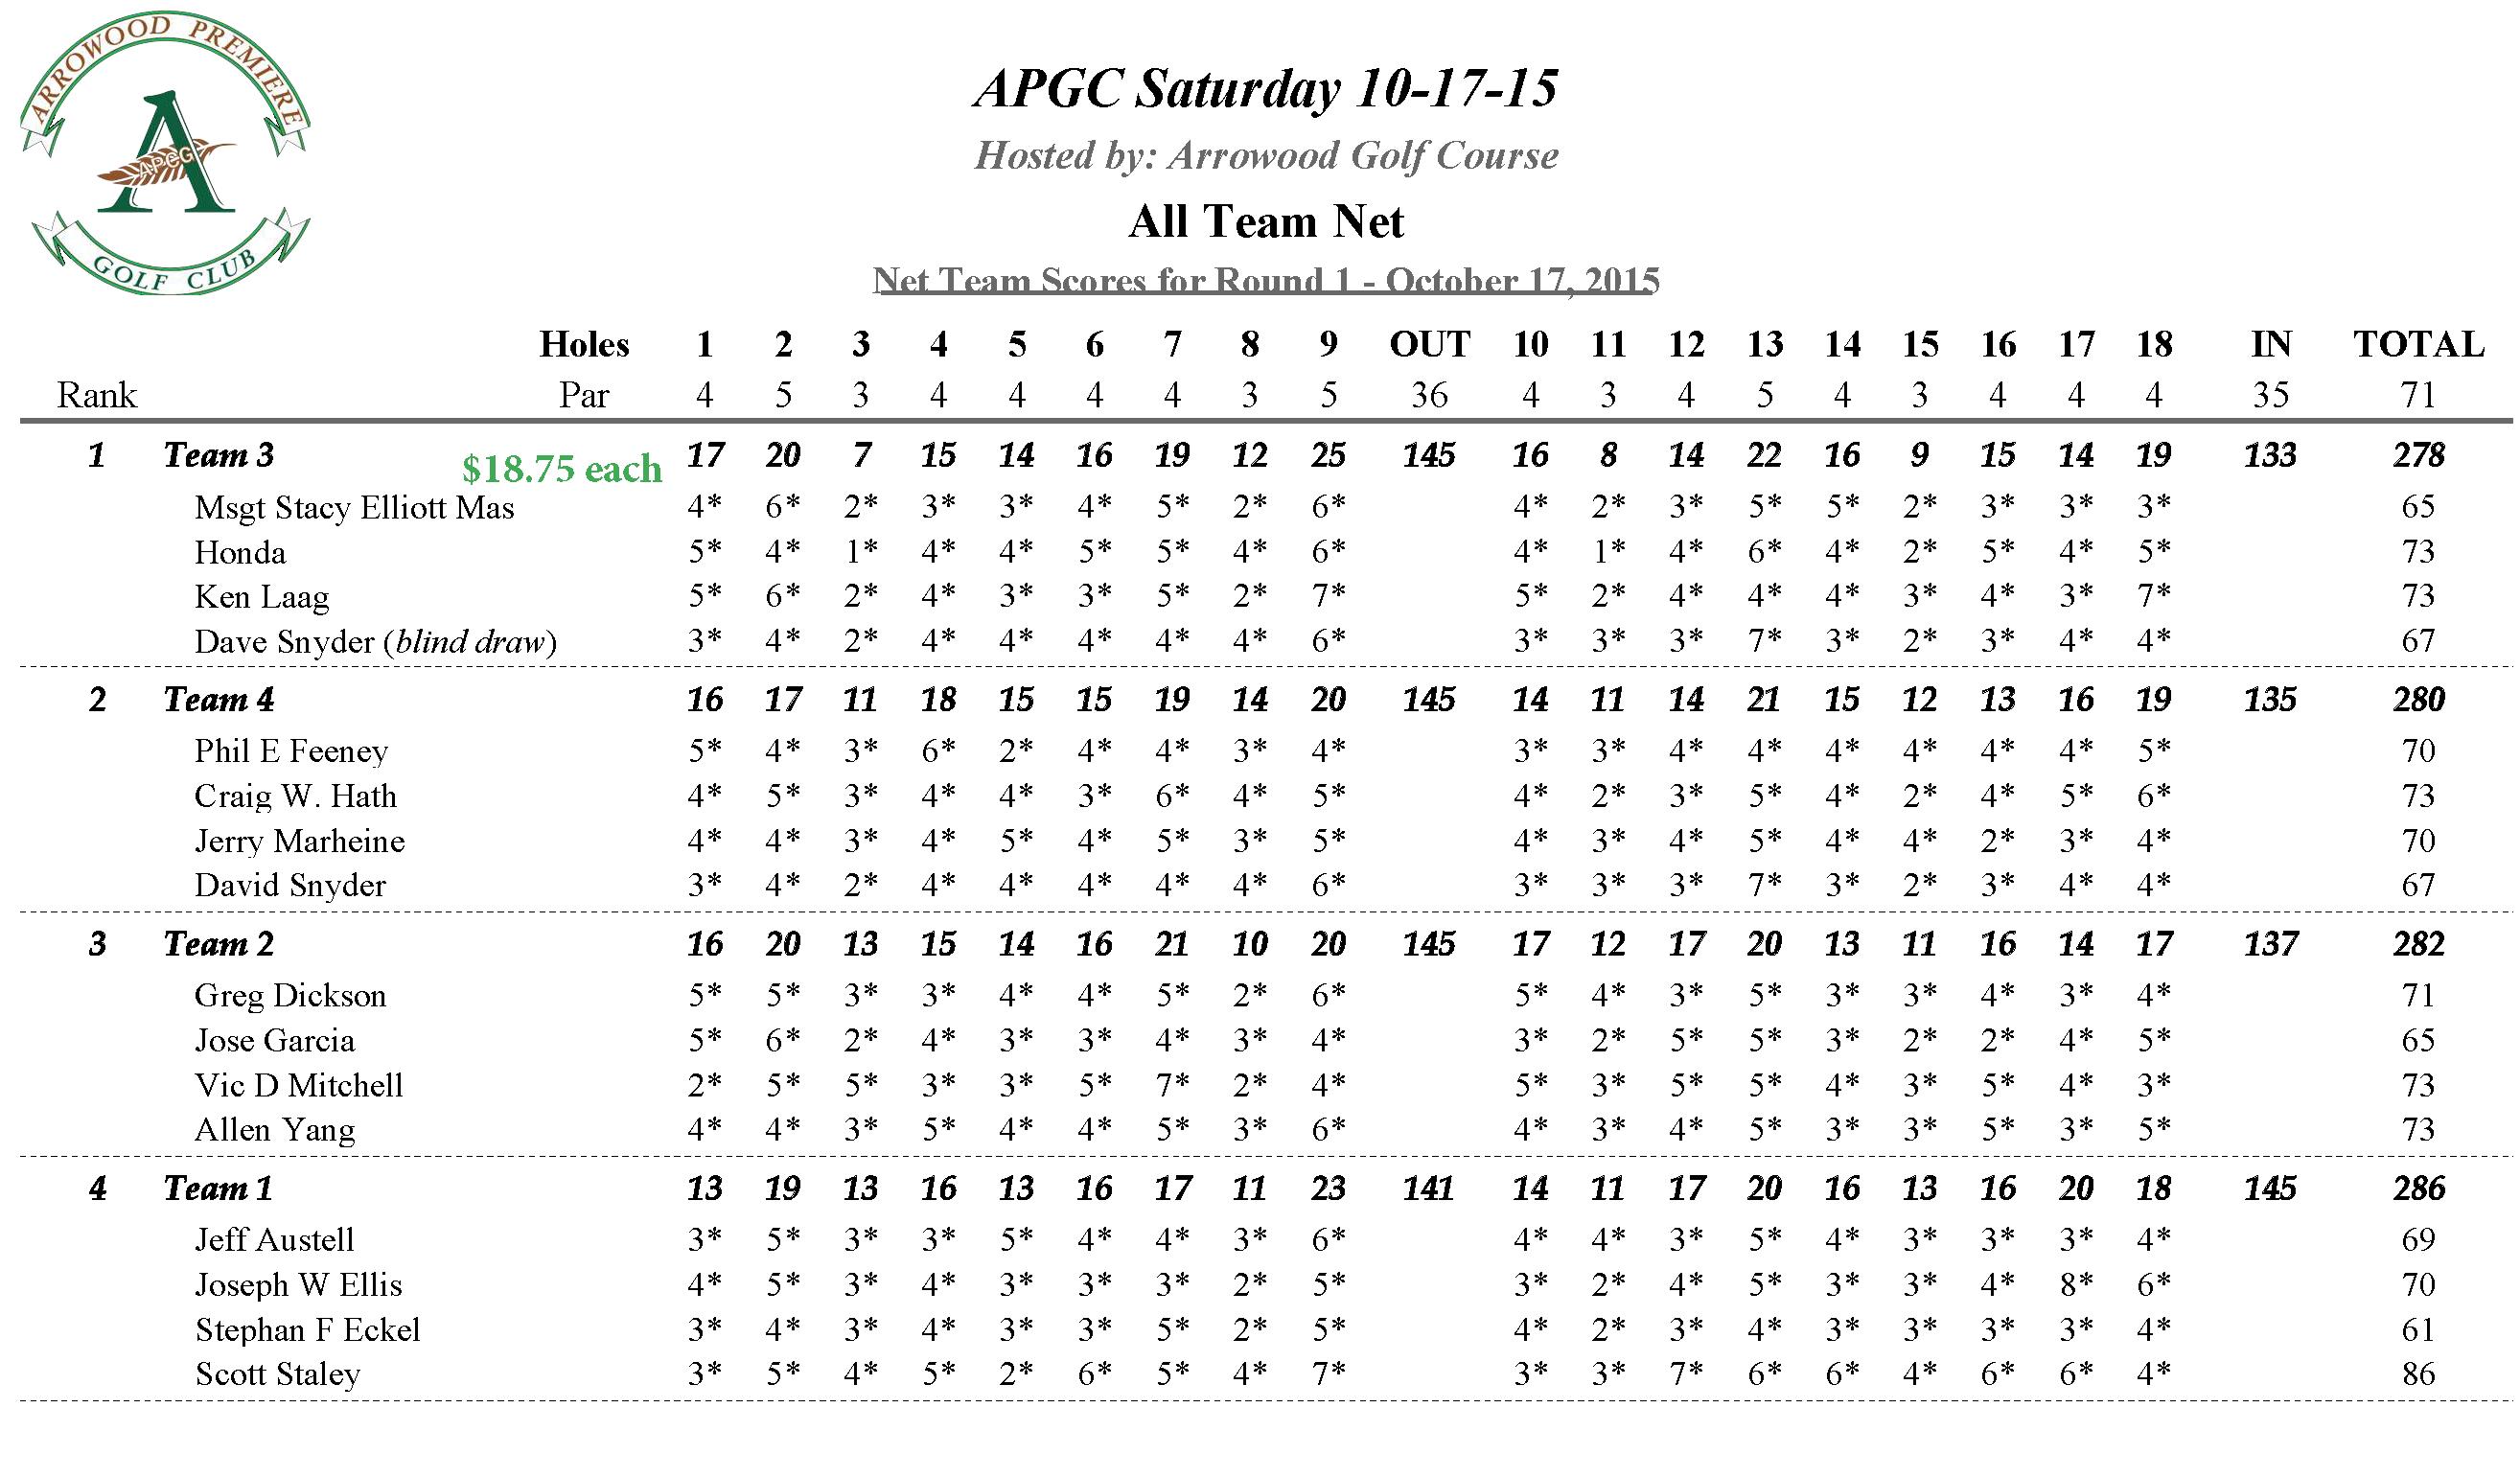 APGC Saturday 10-17-15